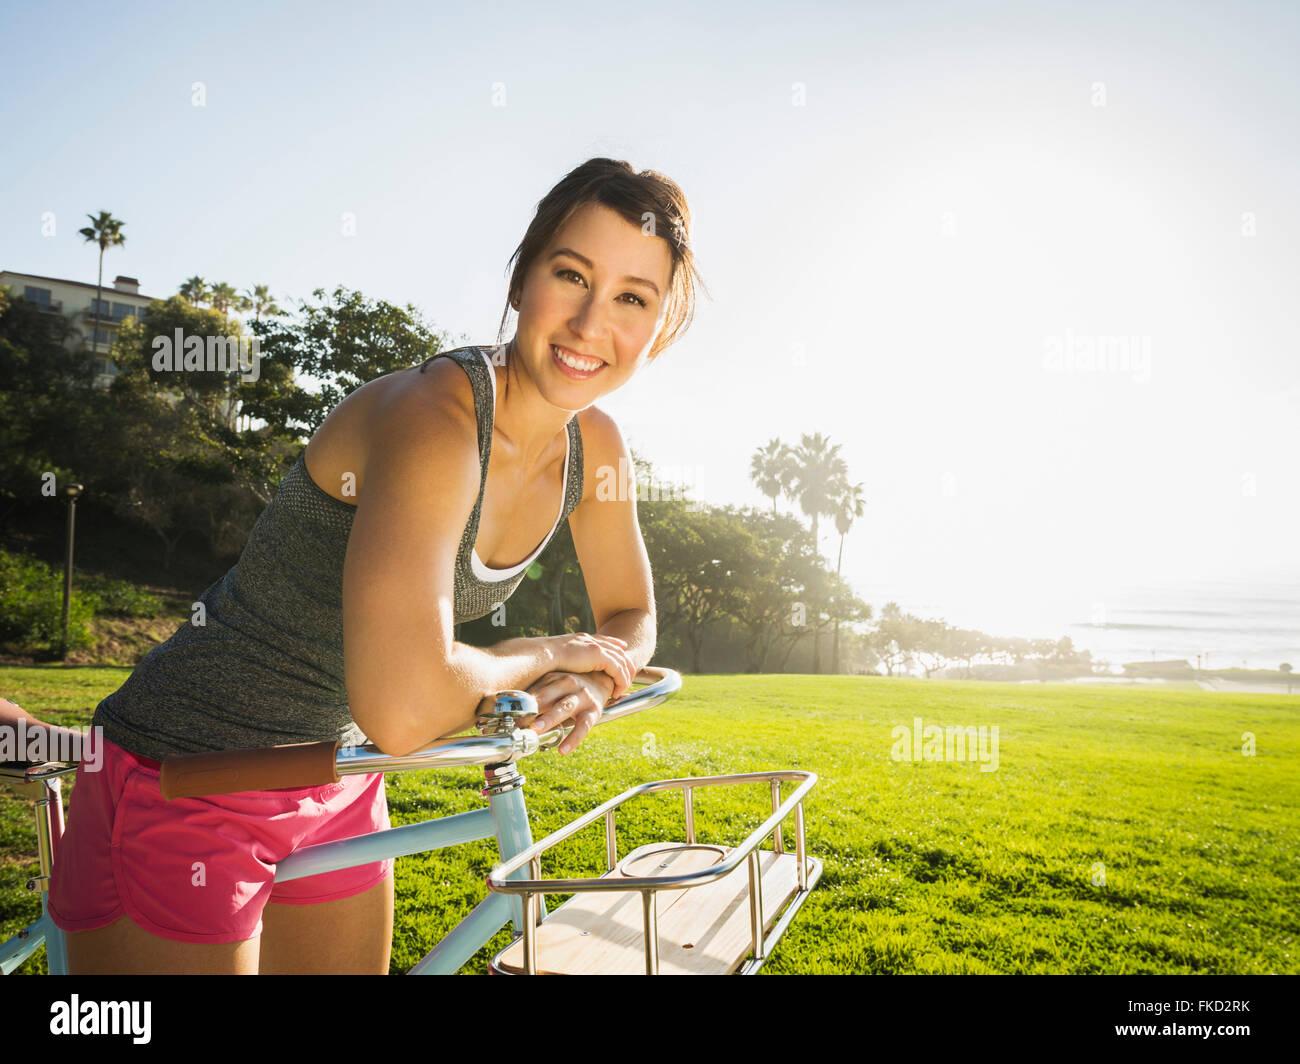 Junge Frau mit dem Fahrrad im park Stockbild